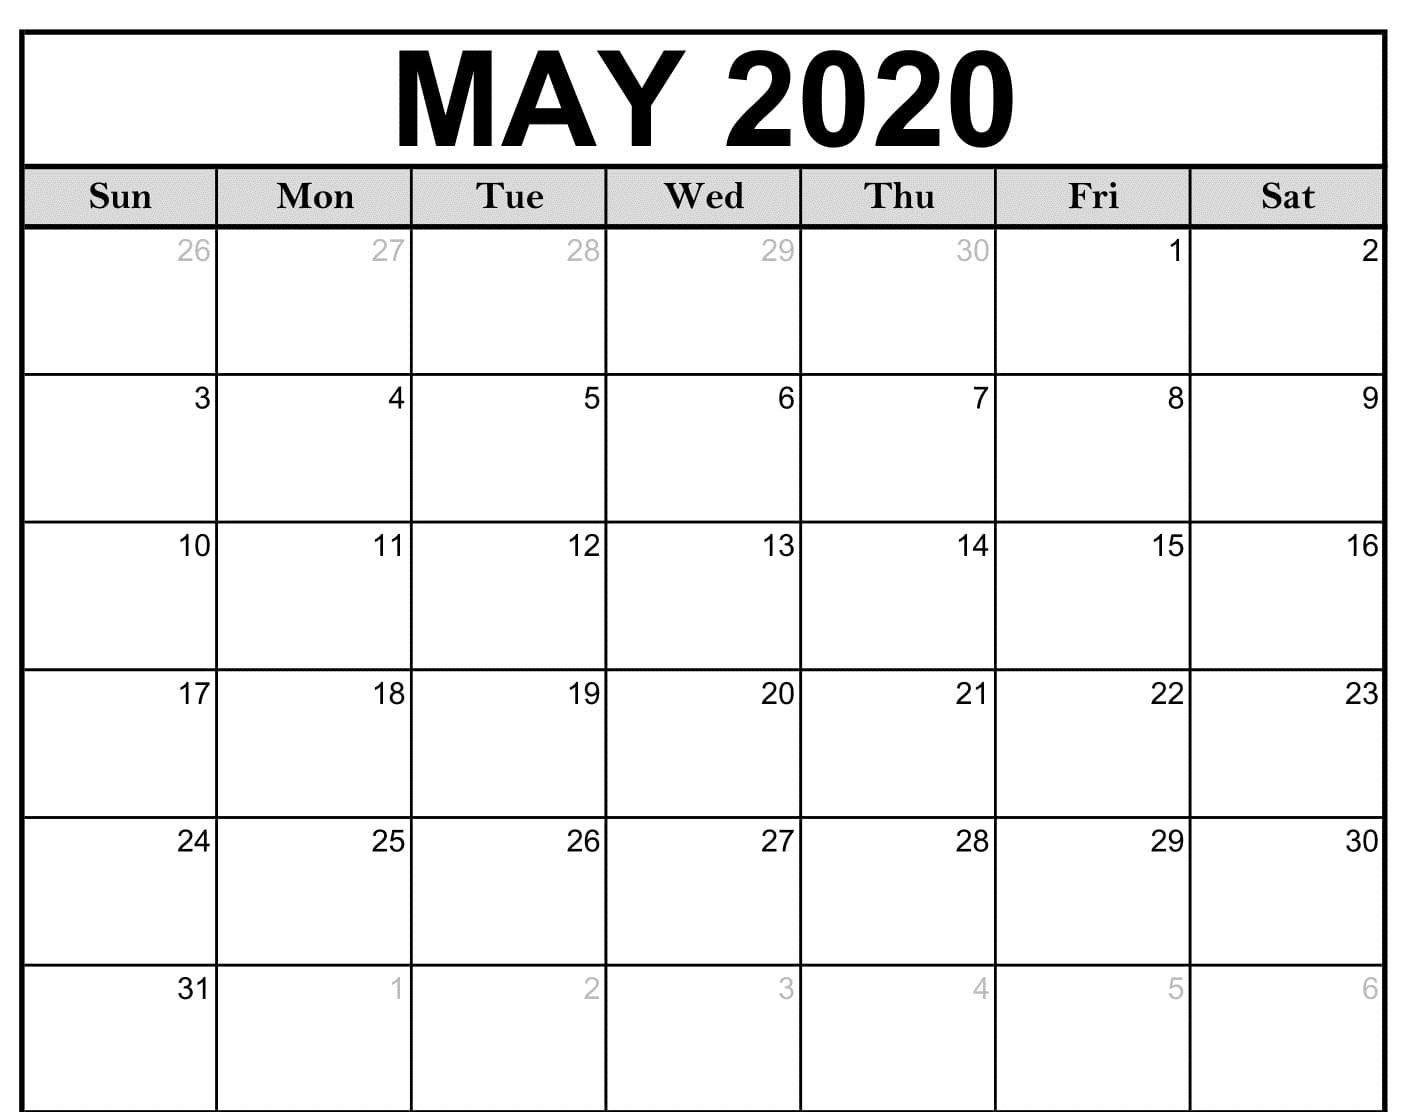 May 2020 Calendar PDF